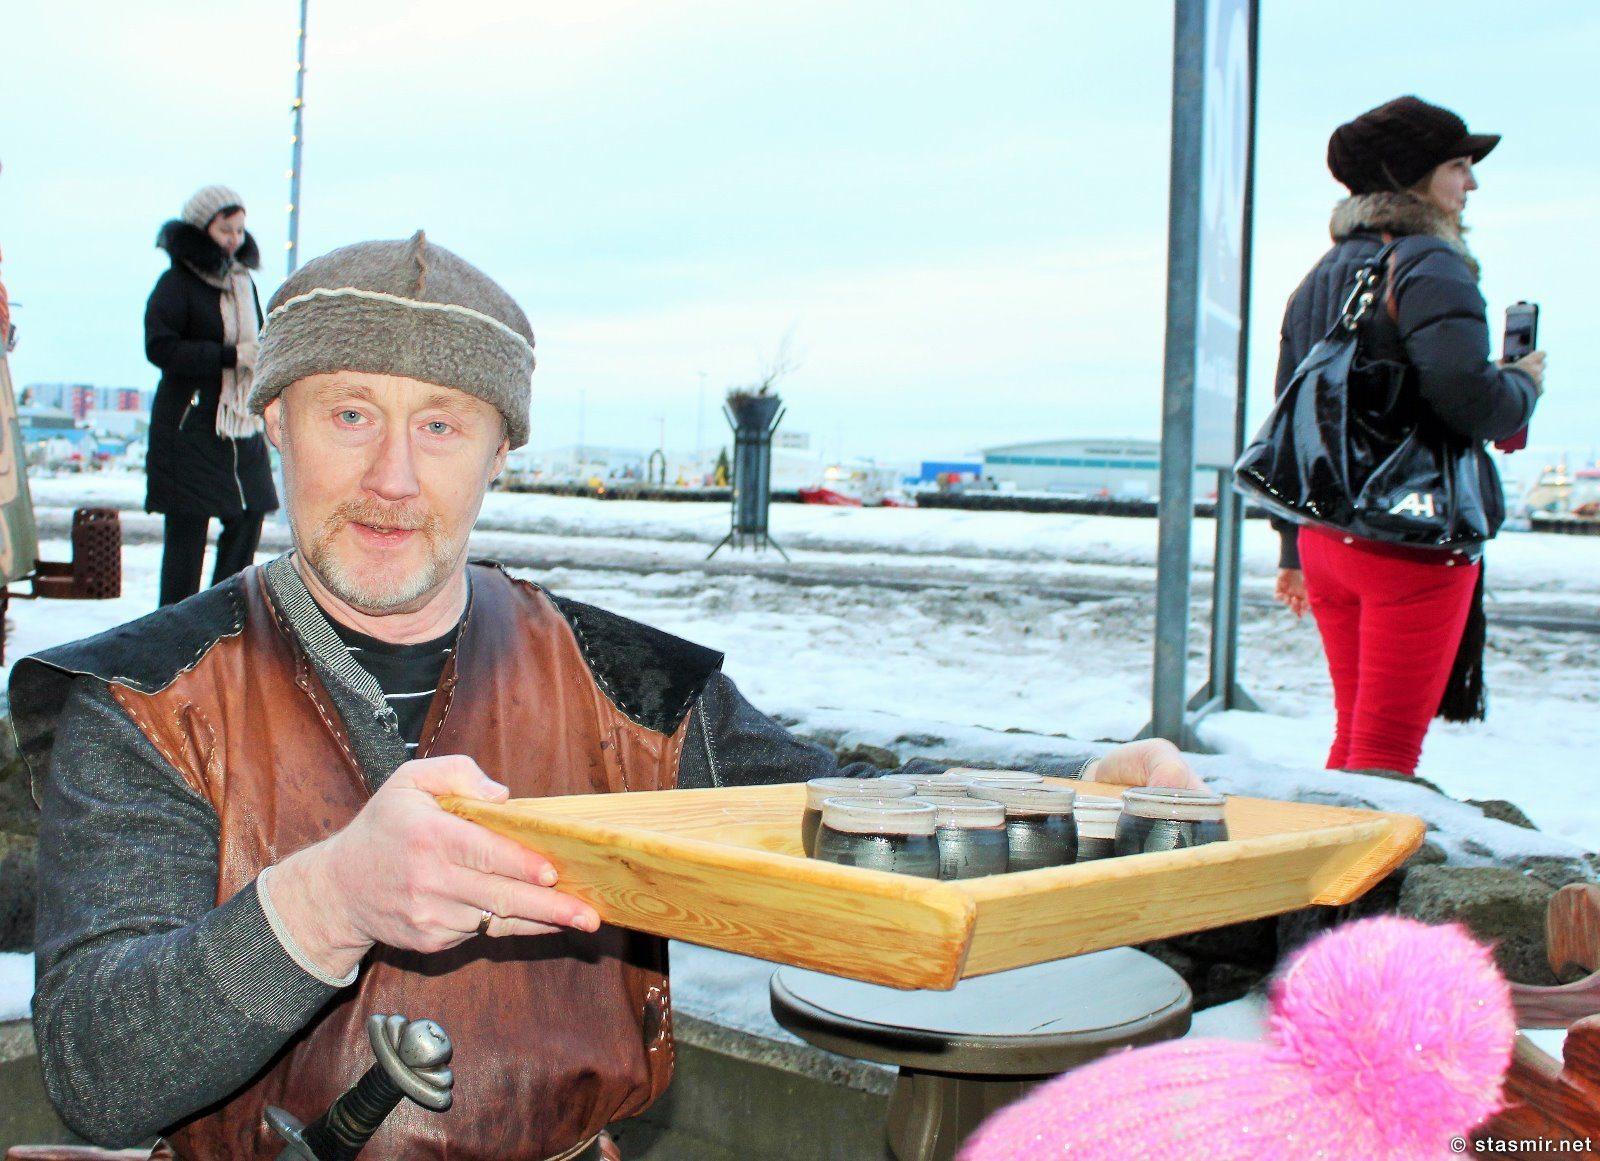 Fjörukráin - ресторан викингов в Хапнарфьёрдюре, фото Стасмир, photo Stasmir